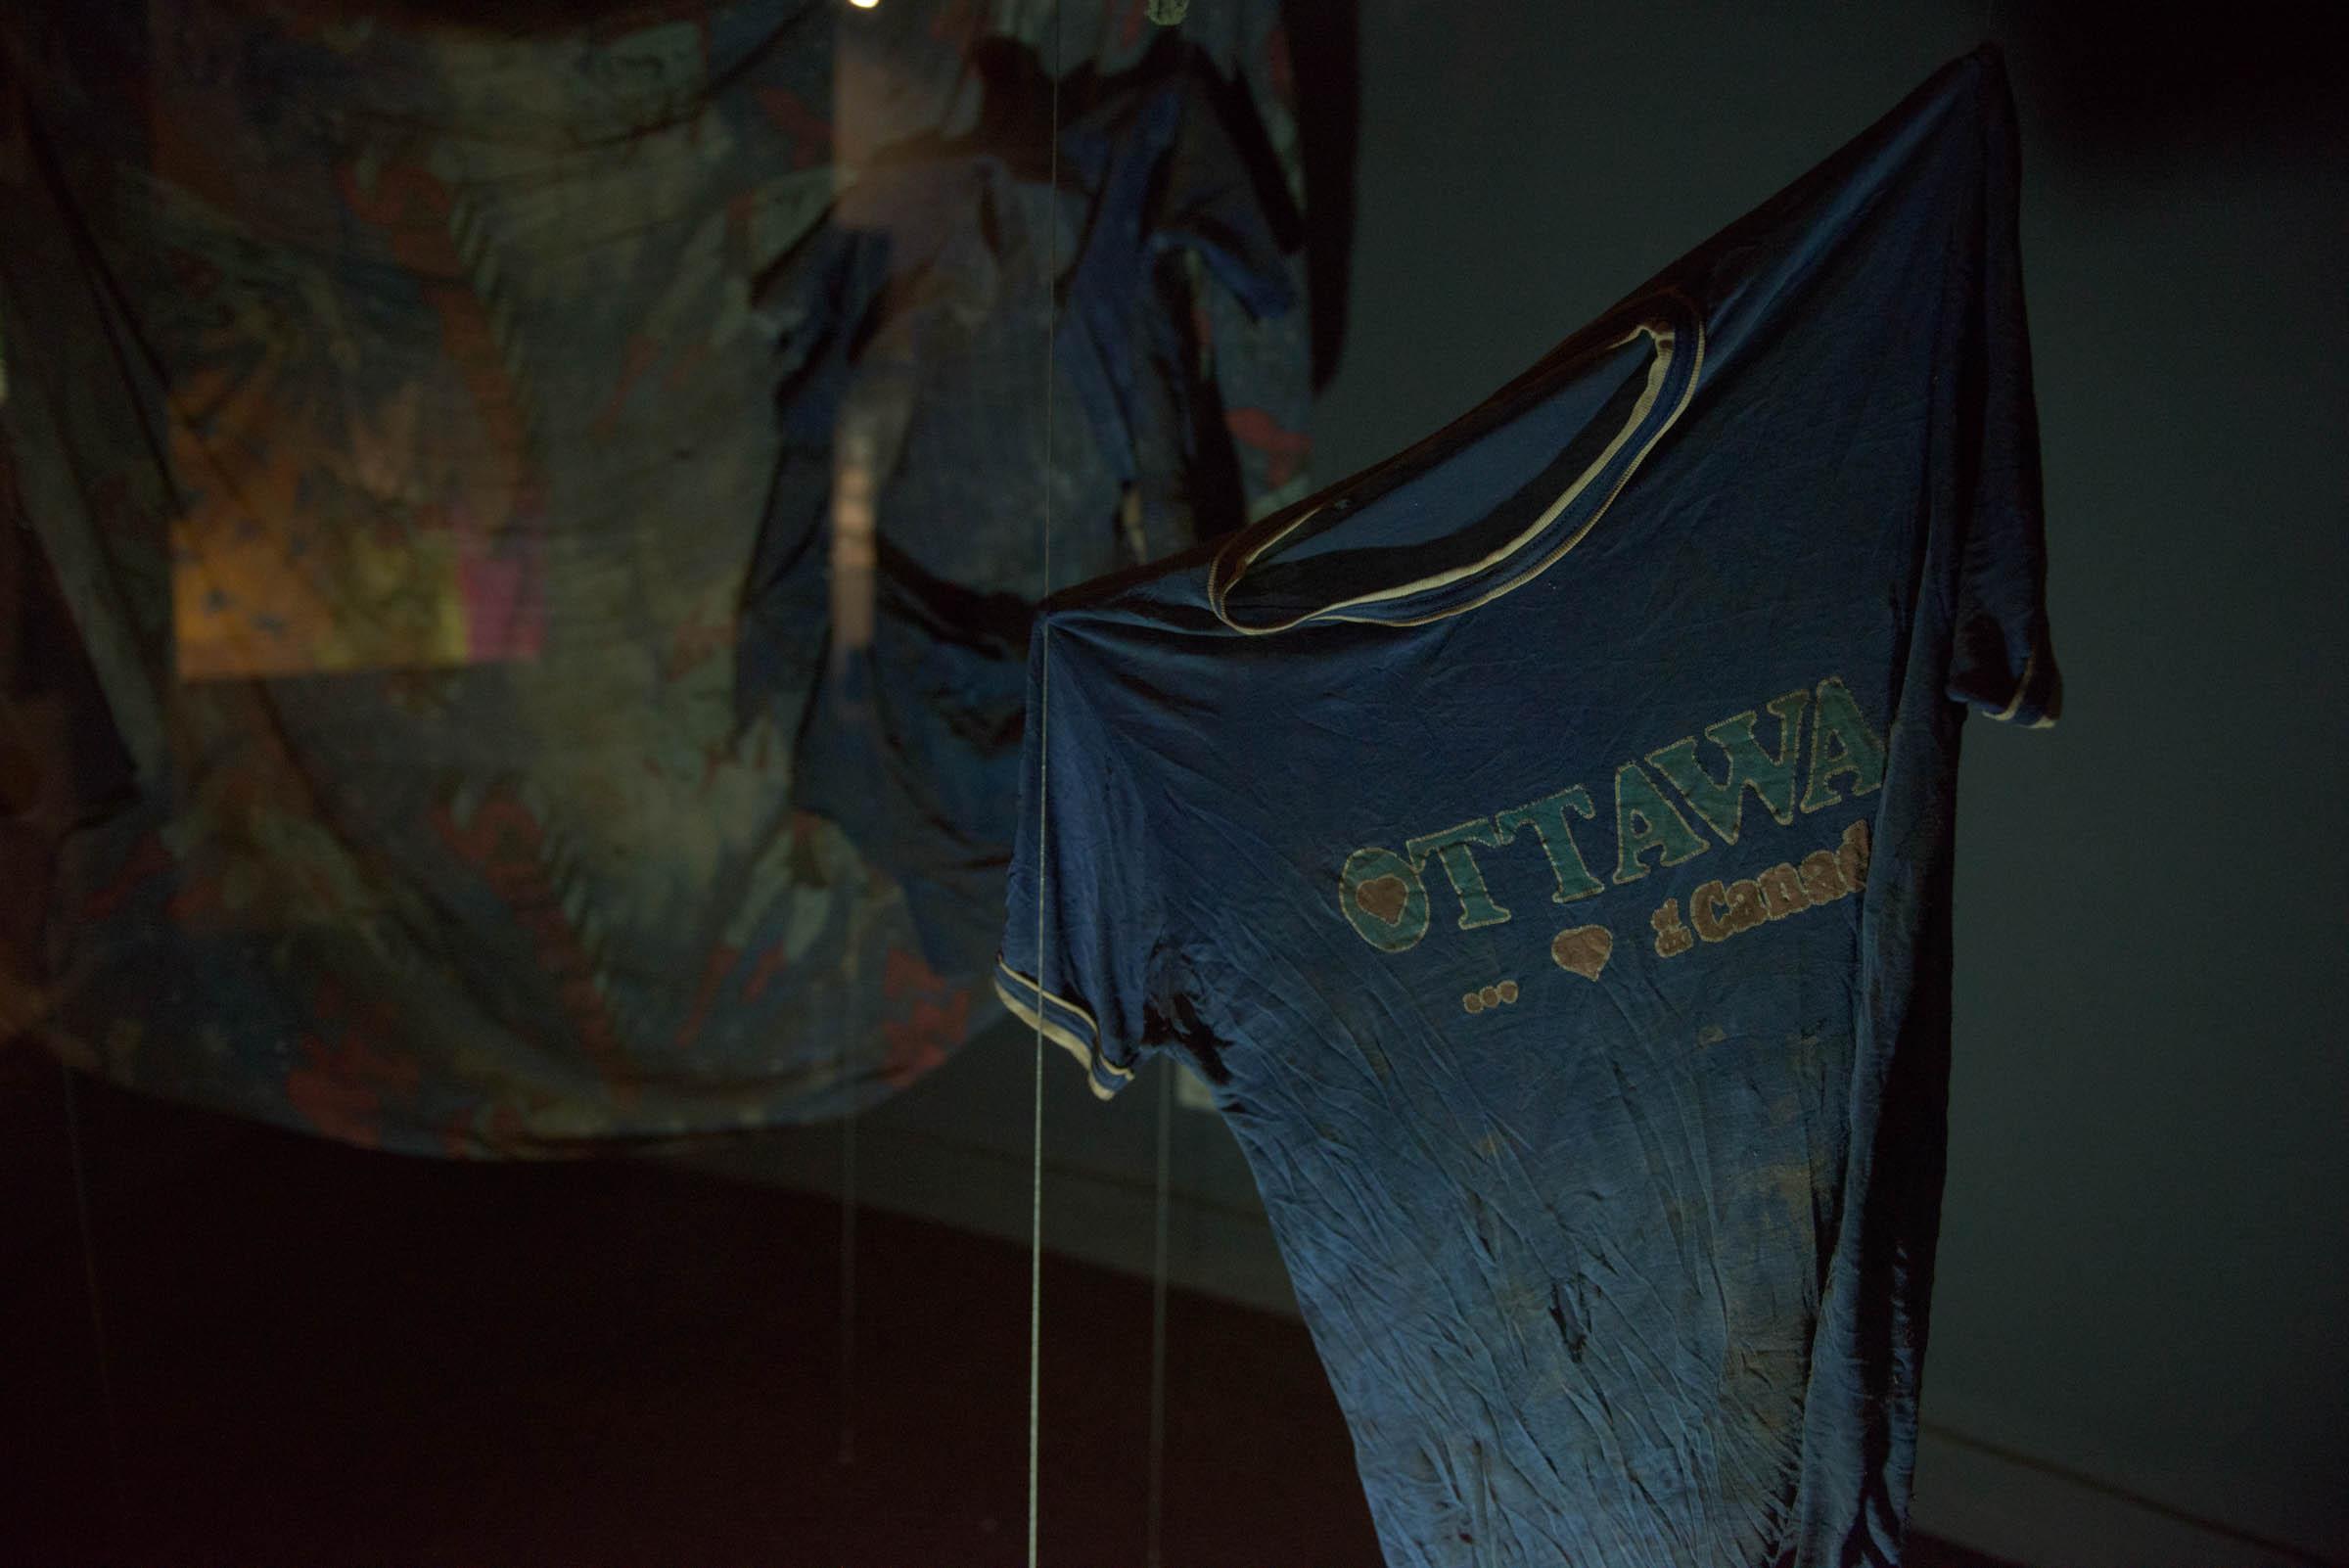 Clothes of a Genocide Victim. Kigali, Rwanda